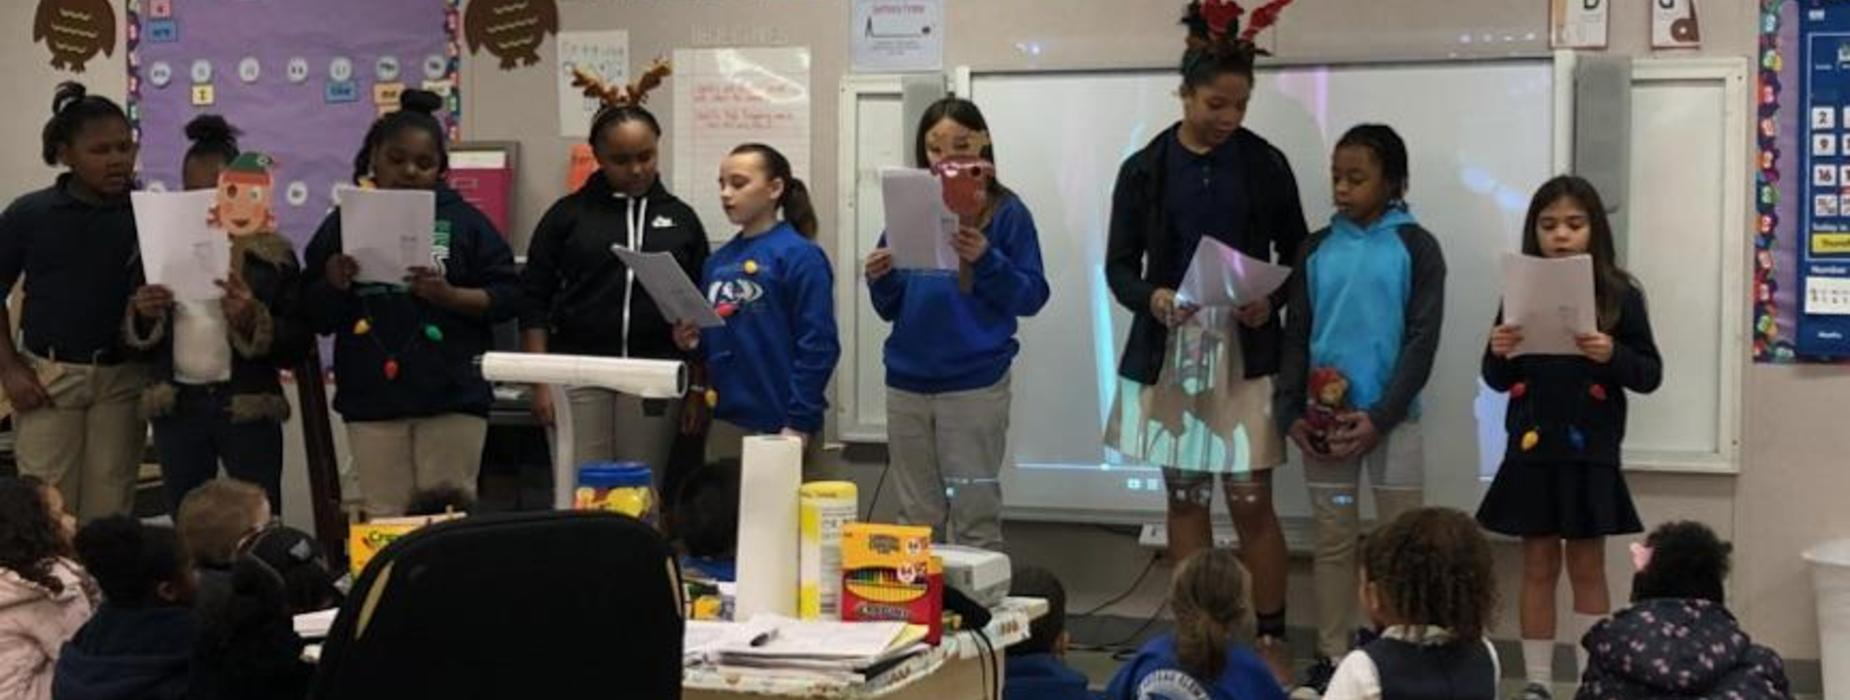 Fourth Grade Students Spread Joy by Singing Christmas Carols!